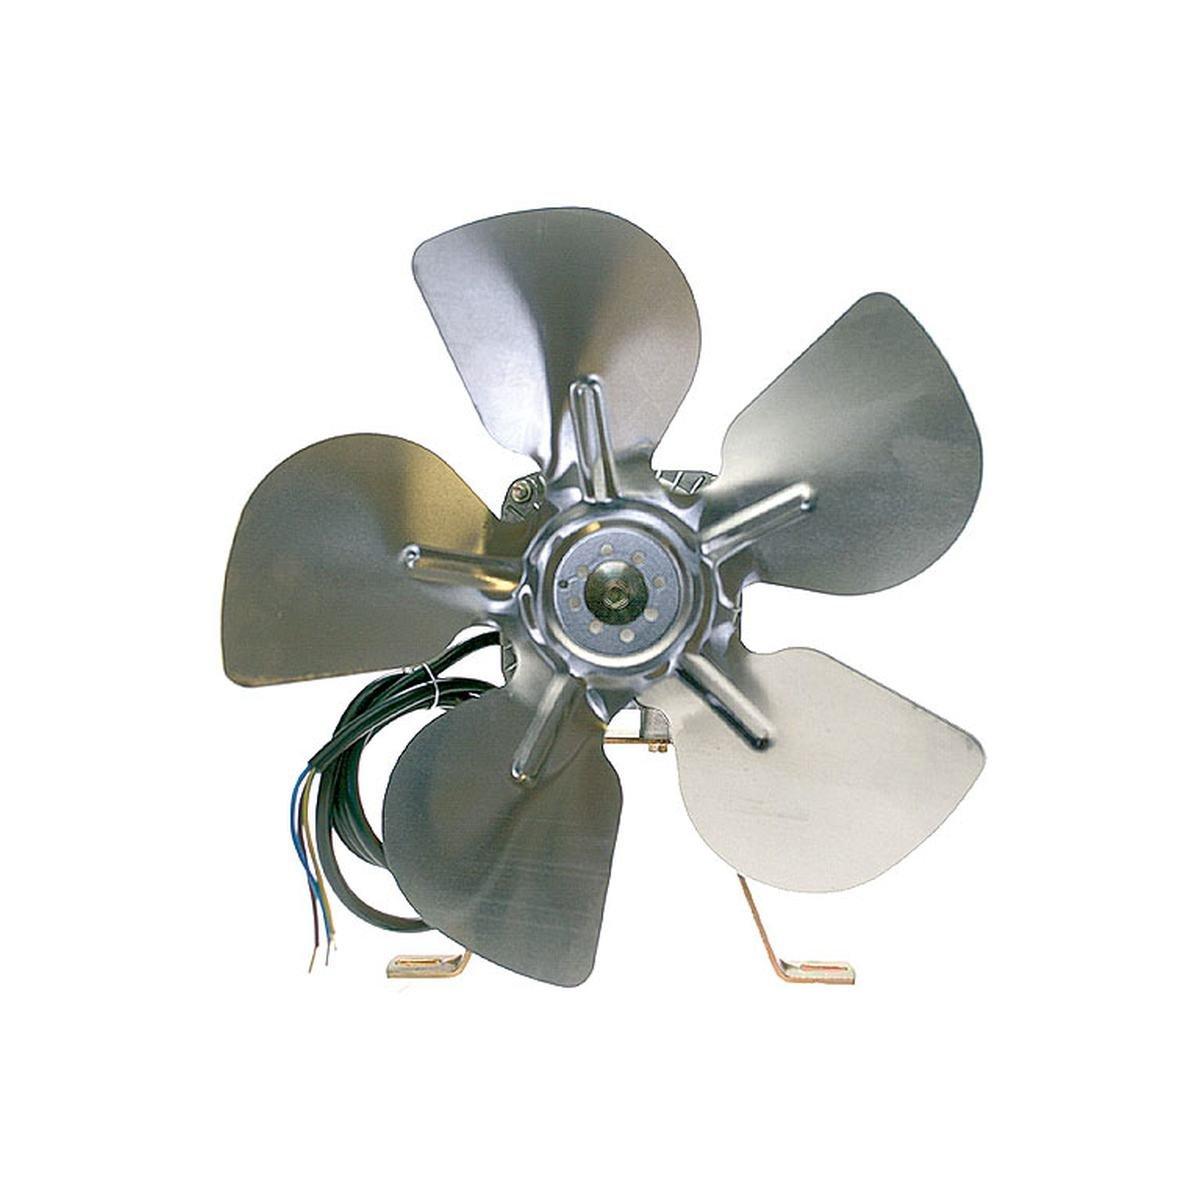 Ventilator 25W med vingediameter 300 mm. - Elco